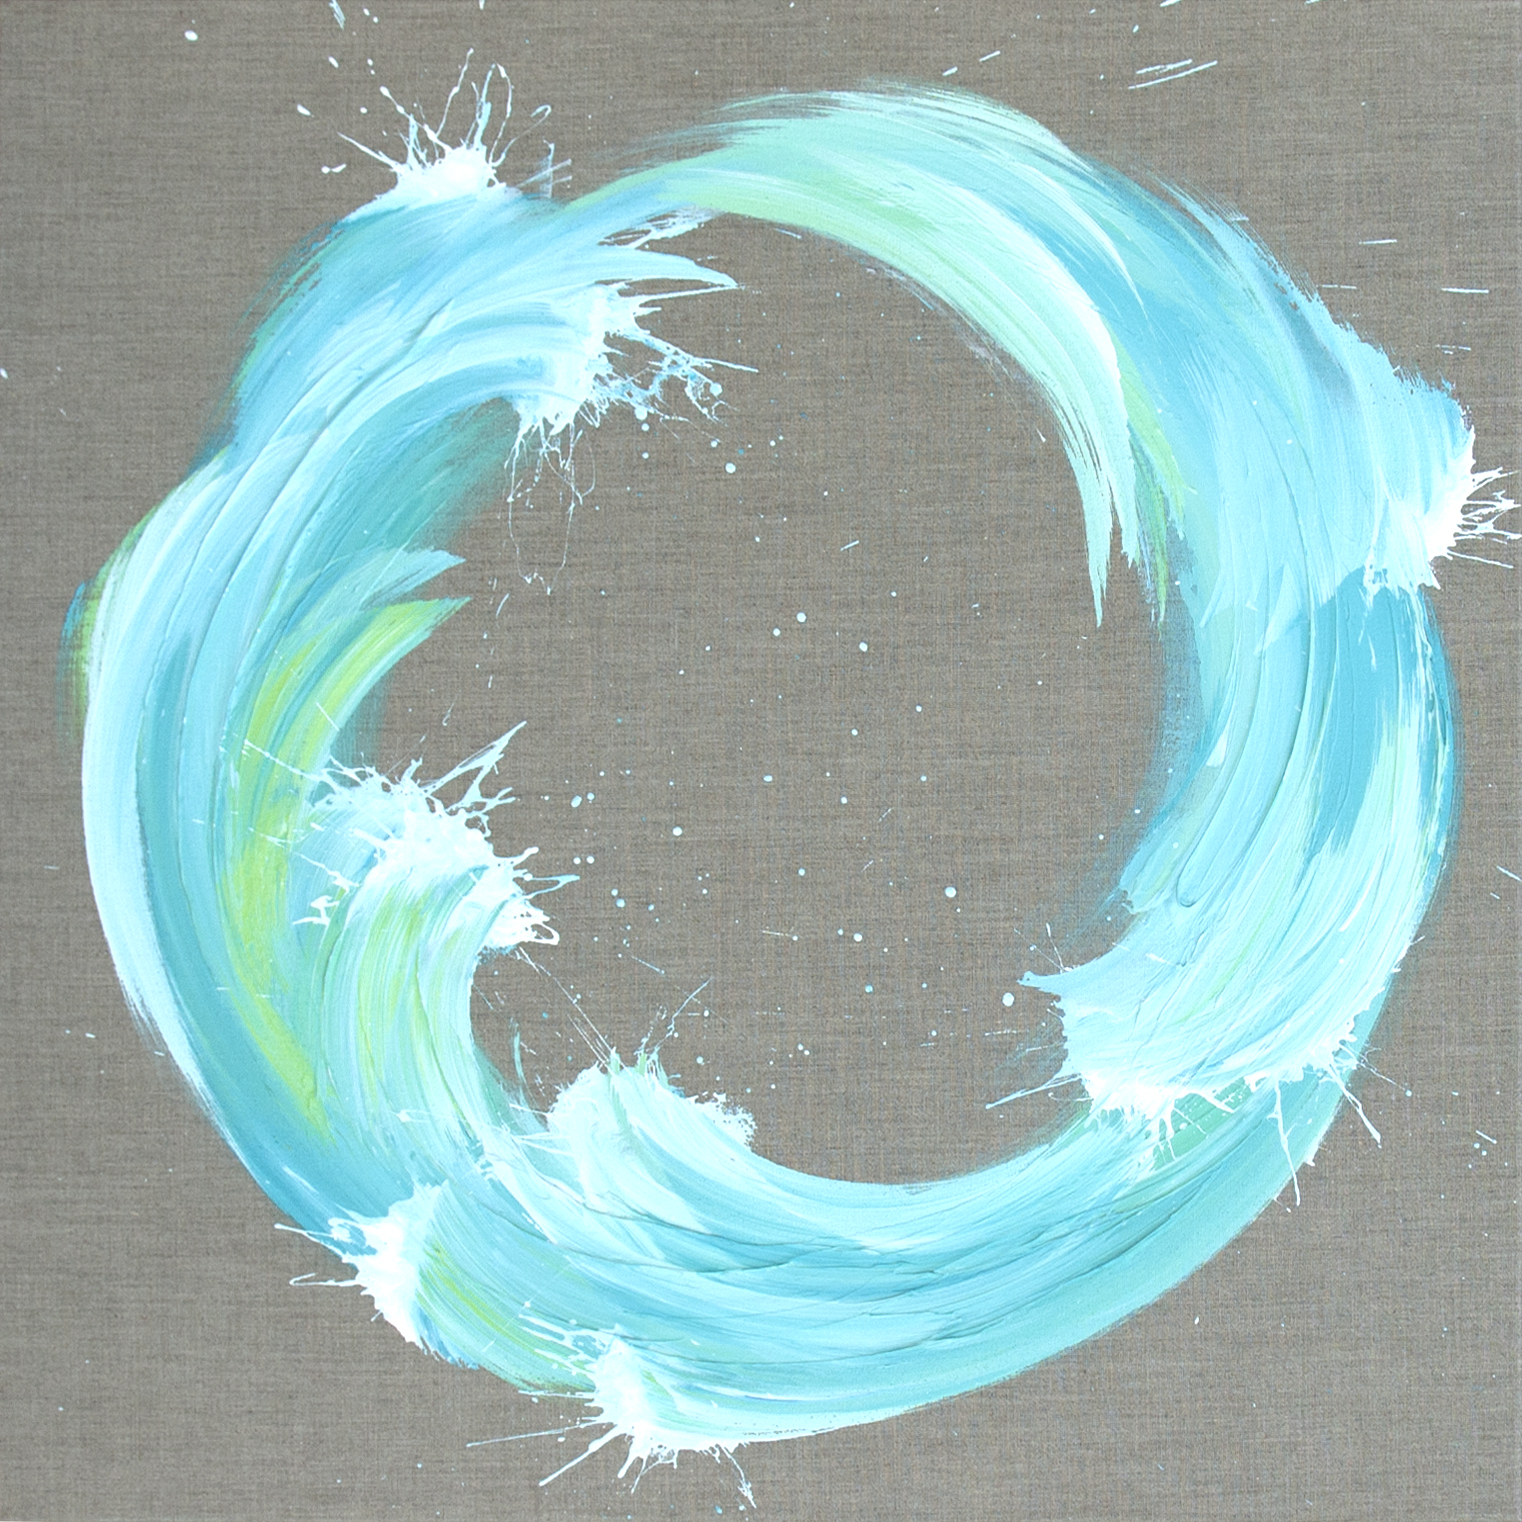 Sea Foam / Vortices